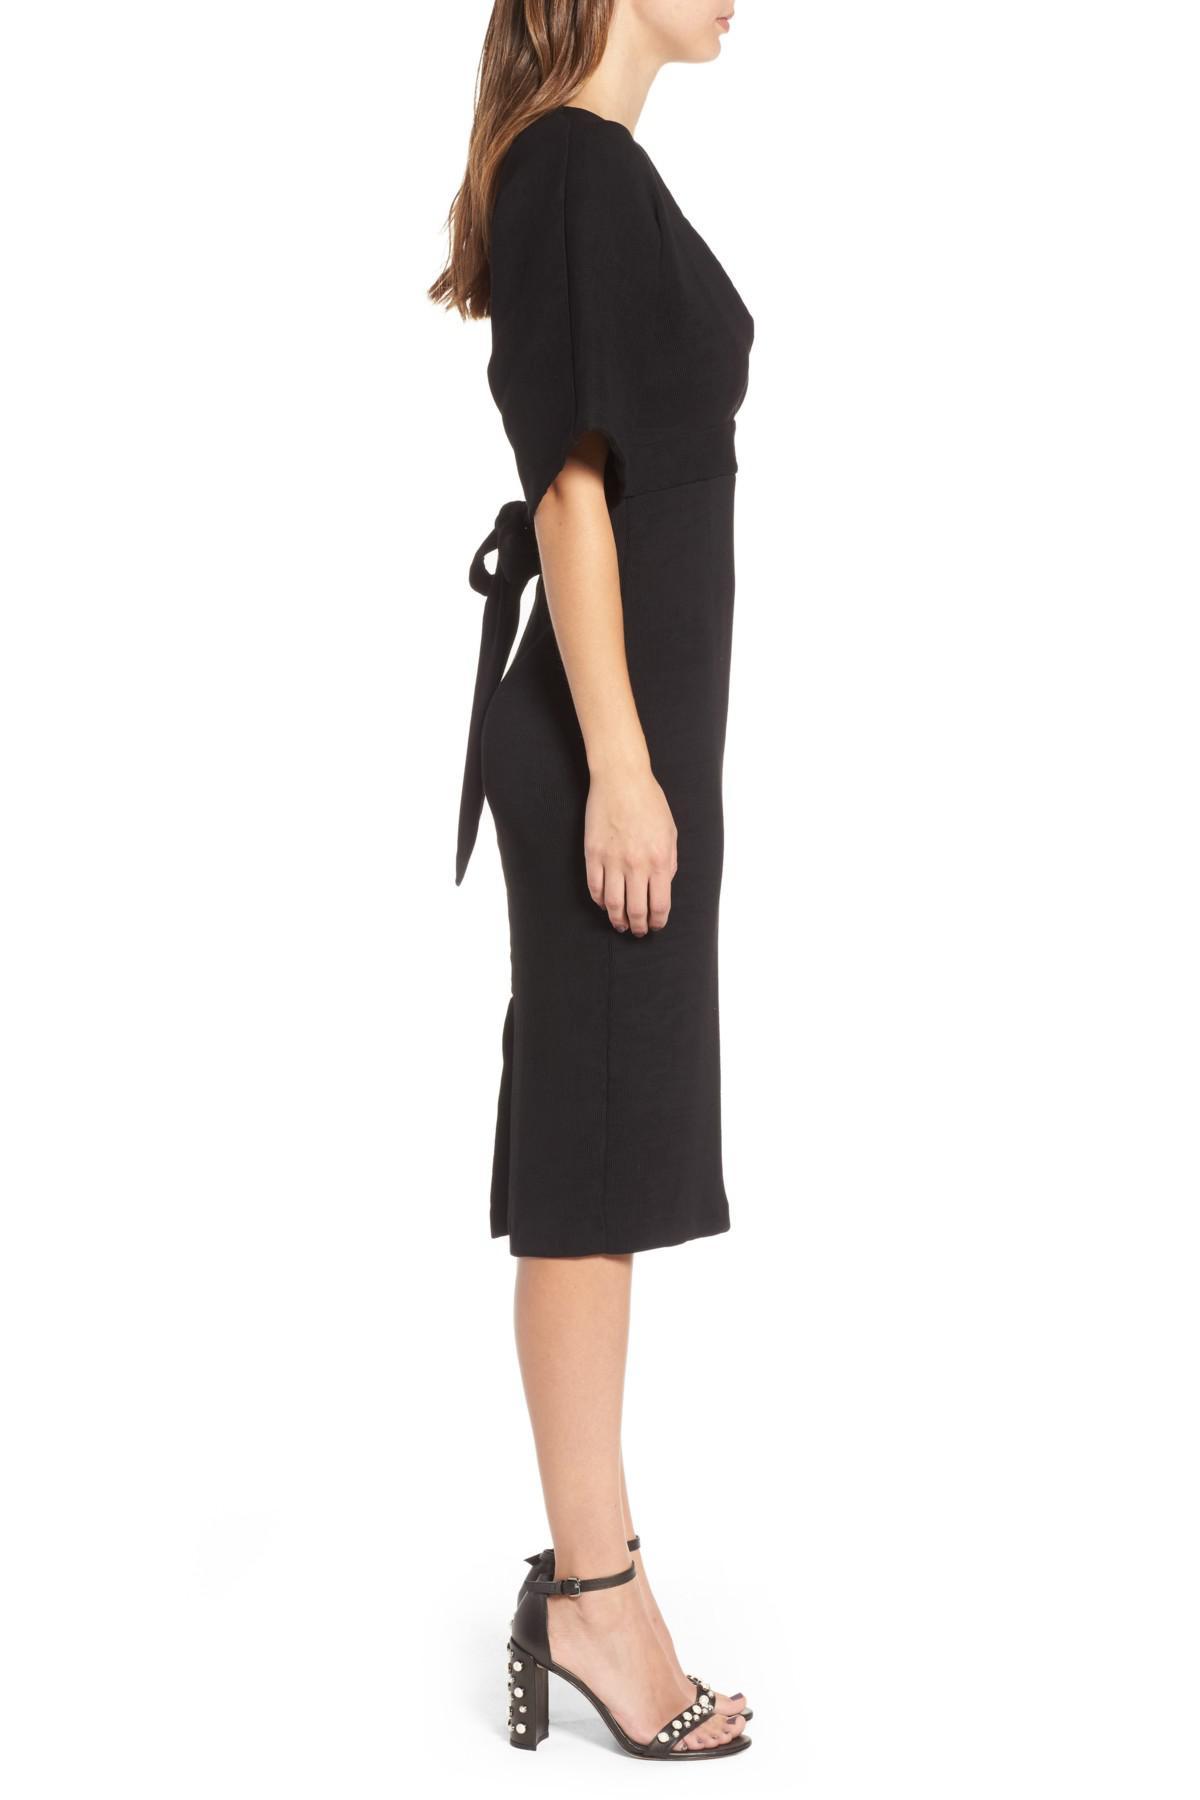 302278bd36 Lyst - TOPSHOP Textured Plunge Midi Dress in Black